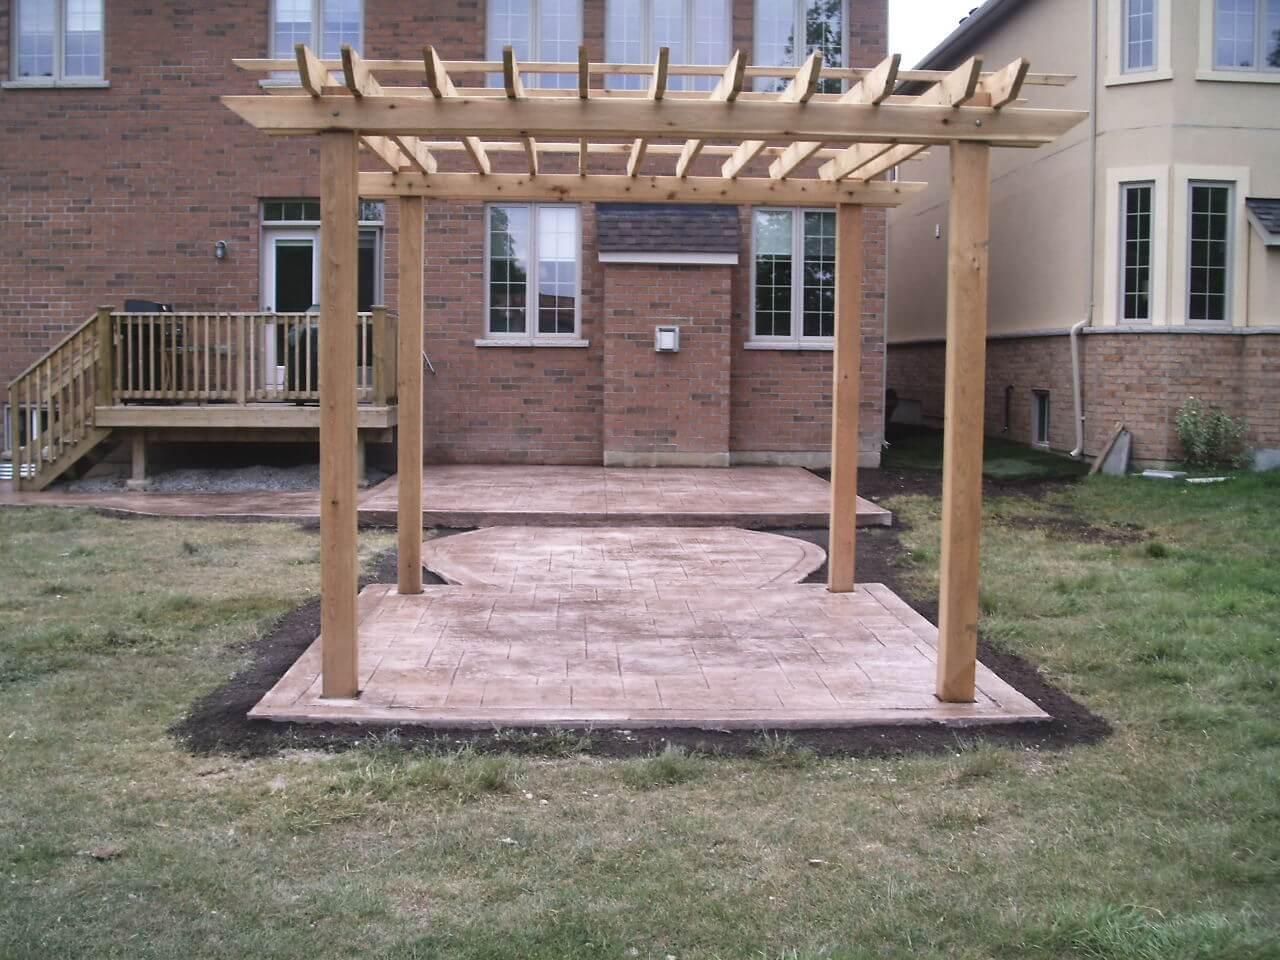 Stamped-Concrete-Construction-Contractor-Toronto-Pergola-Rd-57